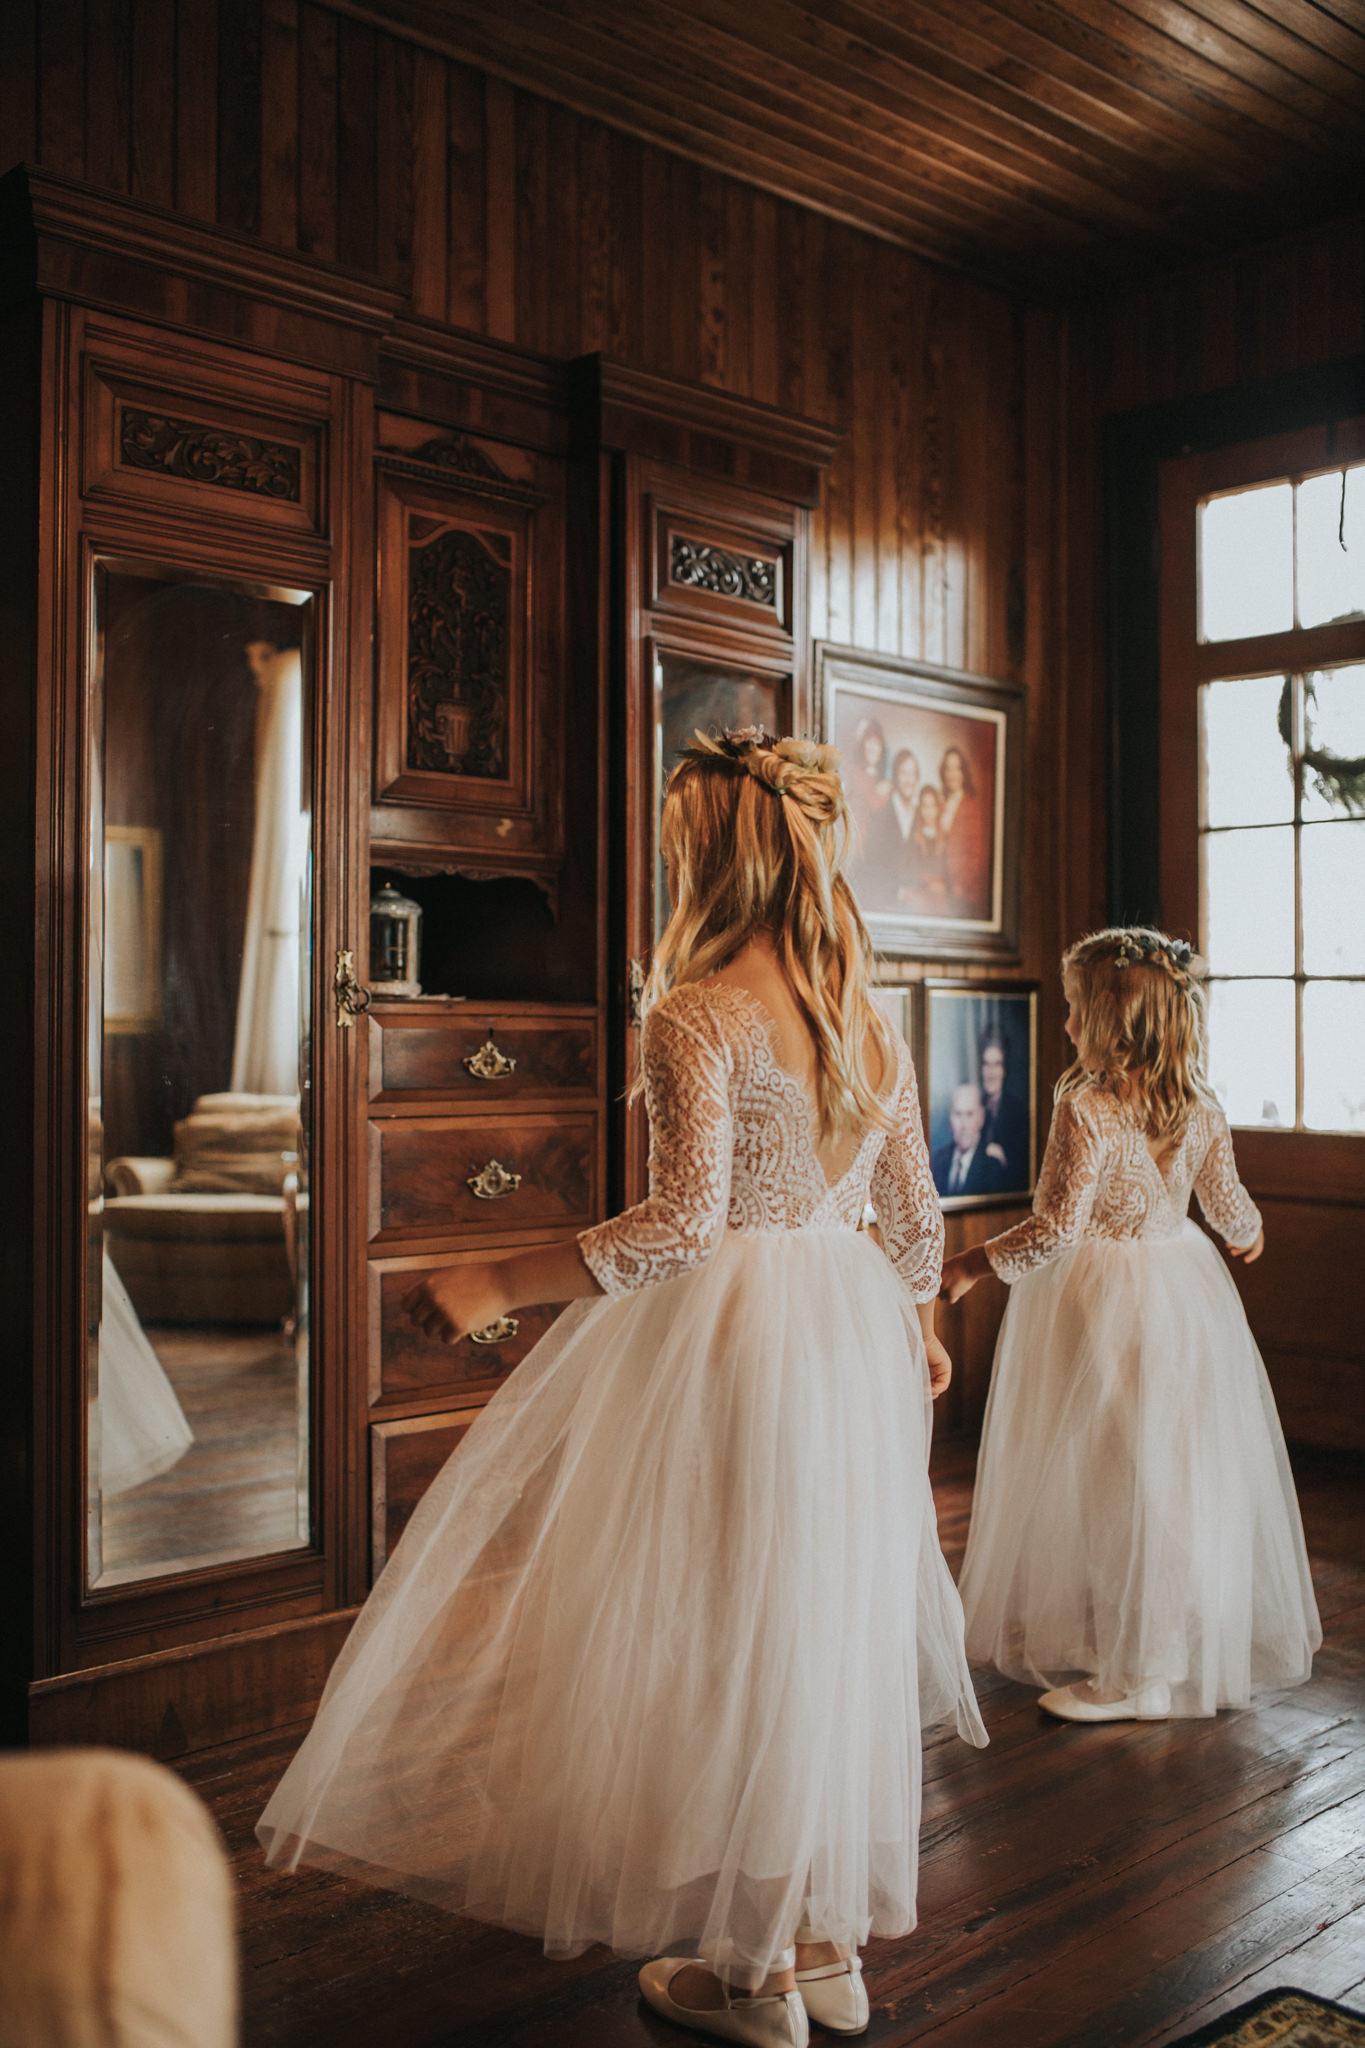 KateMatt-North-Georgia-Wedding-Photographer-Mountain-Laurel-Farm-28.jpg